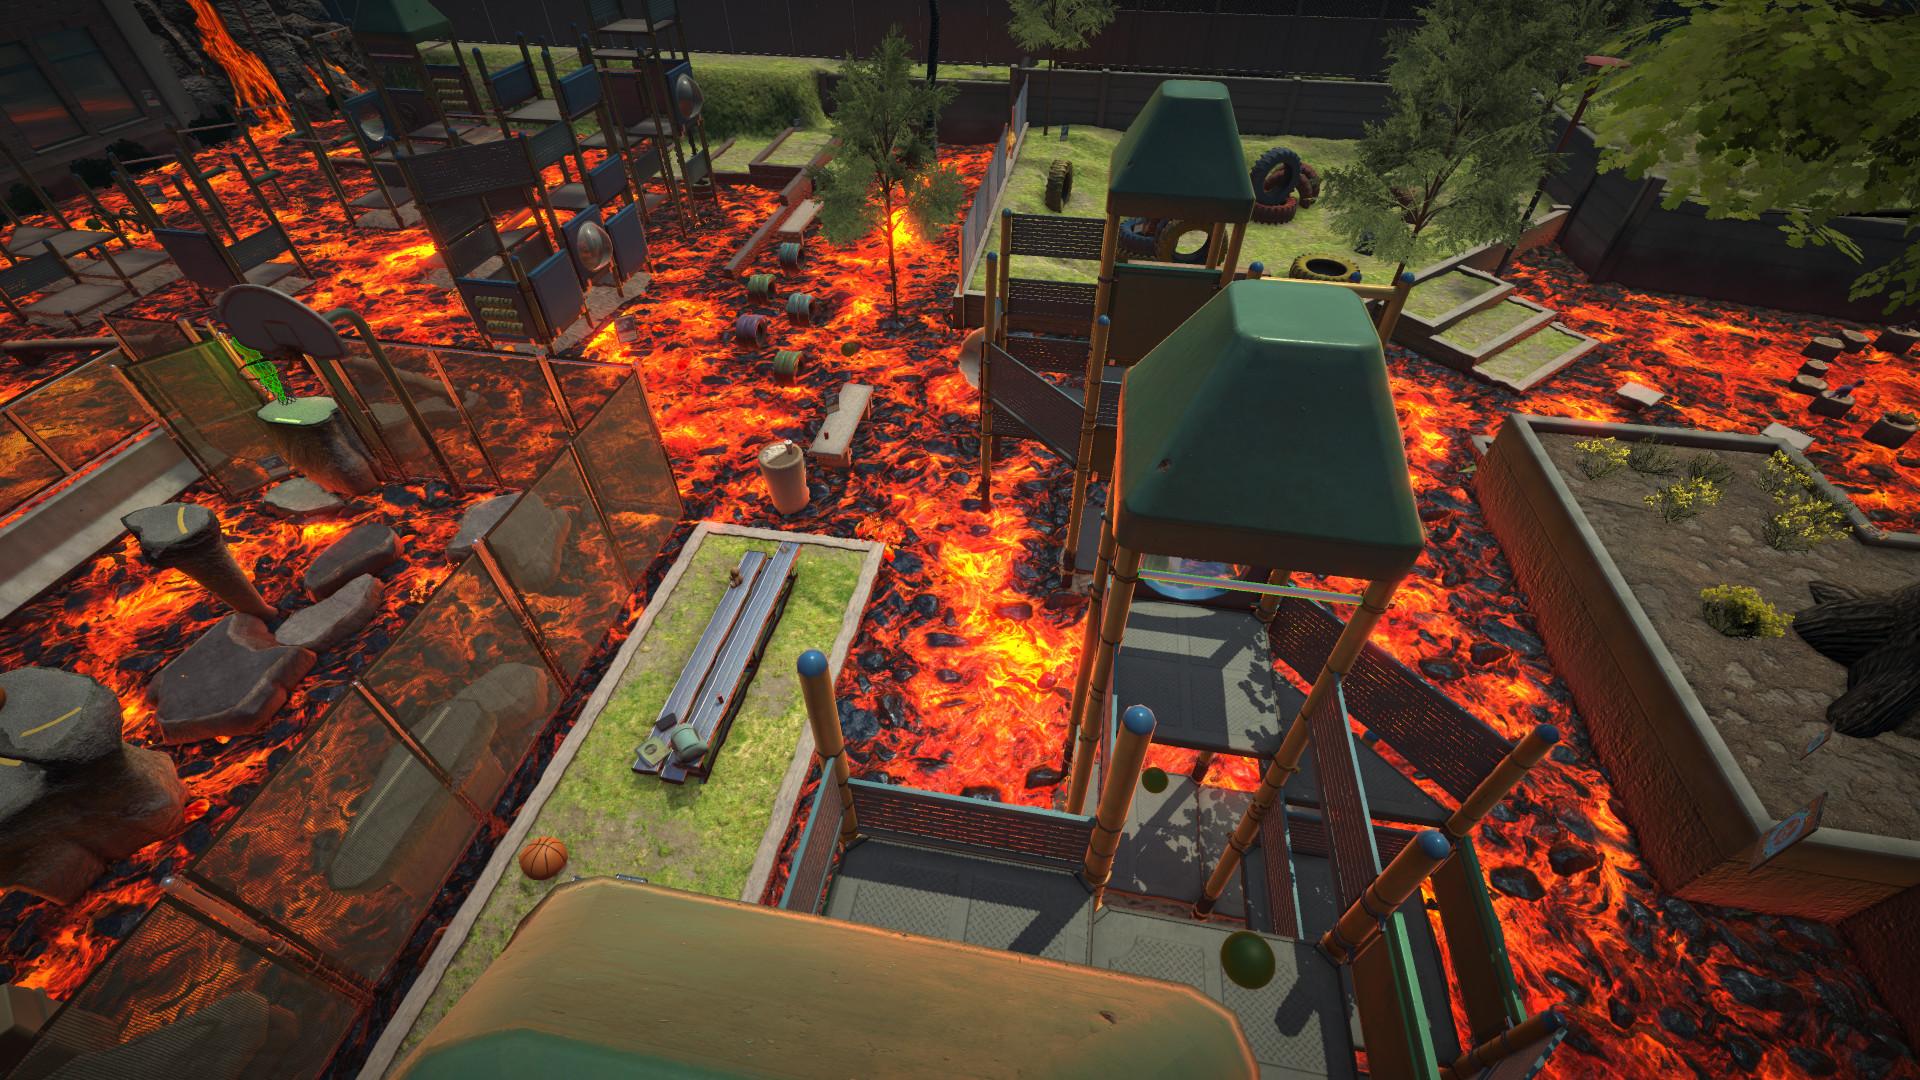 Hot Lava Schulhof